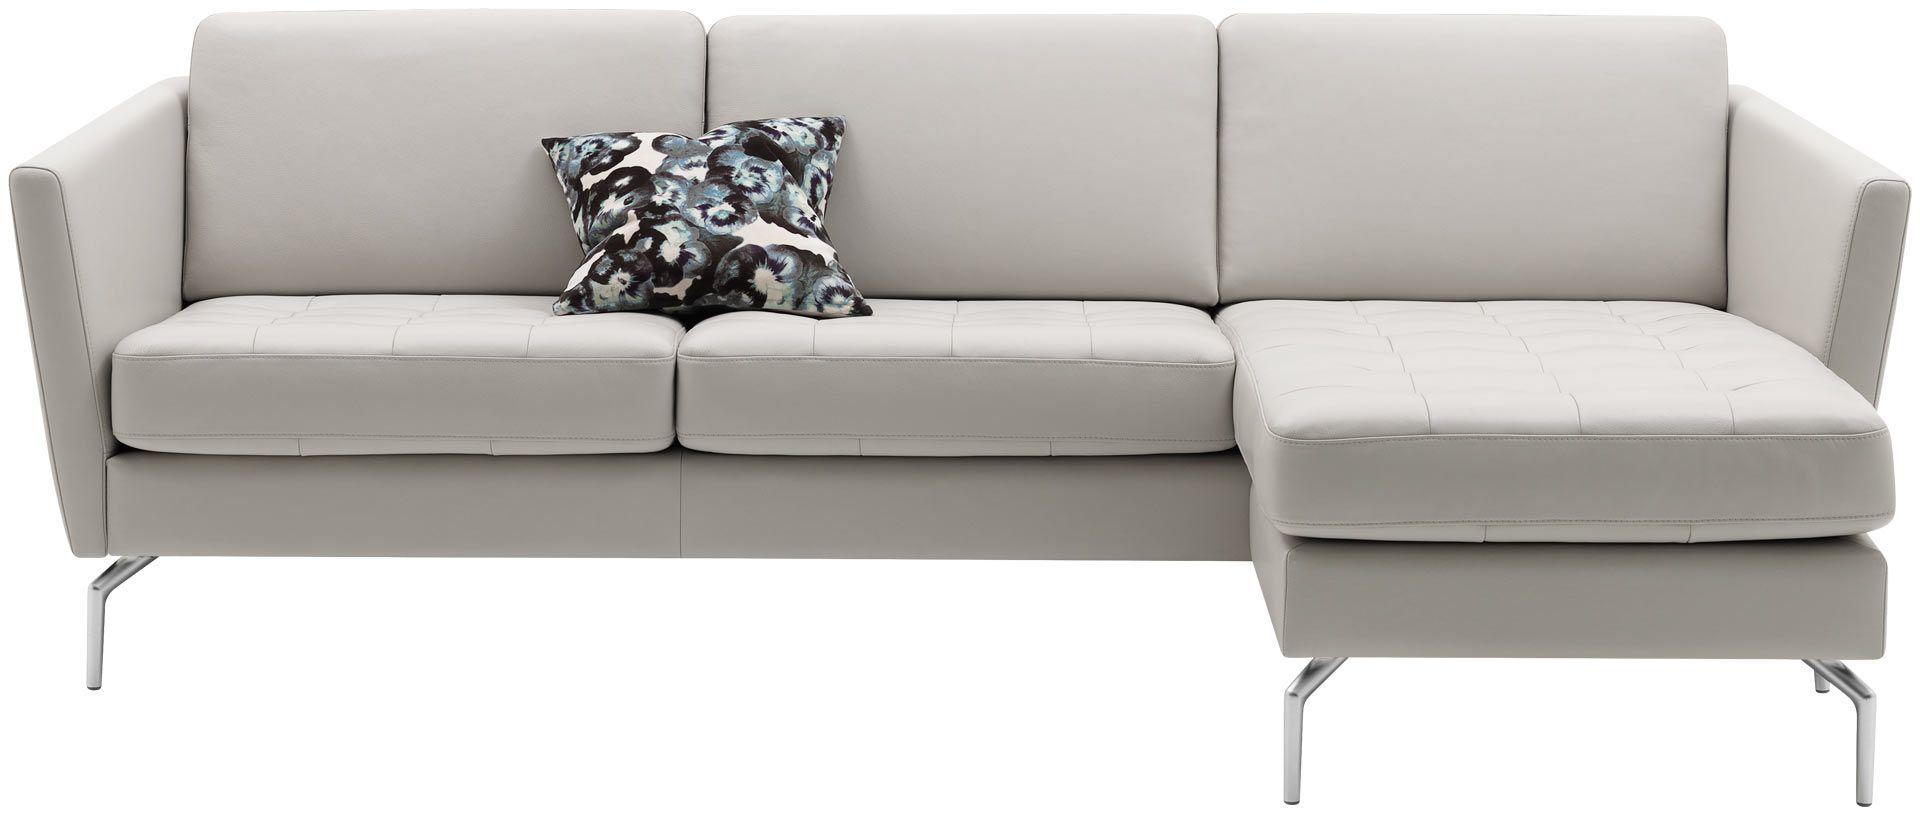 Osaka Sofa Customize Your Own Sofa